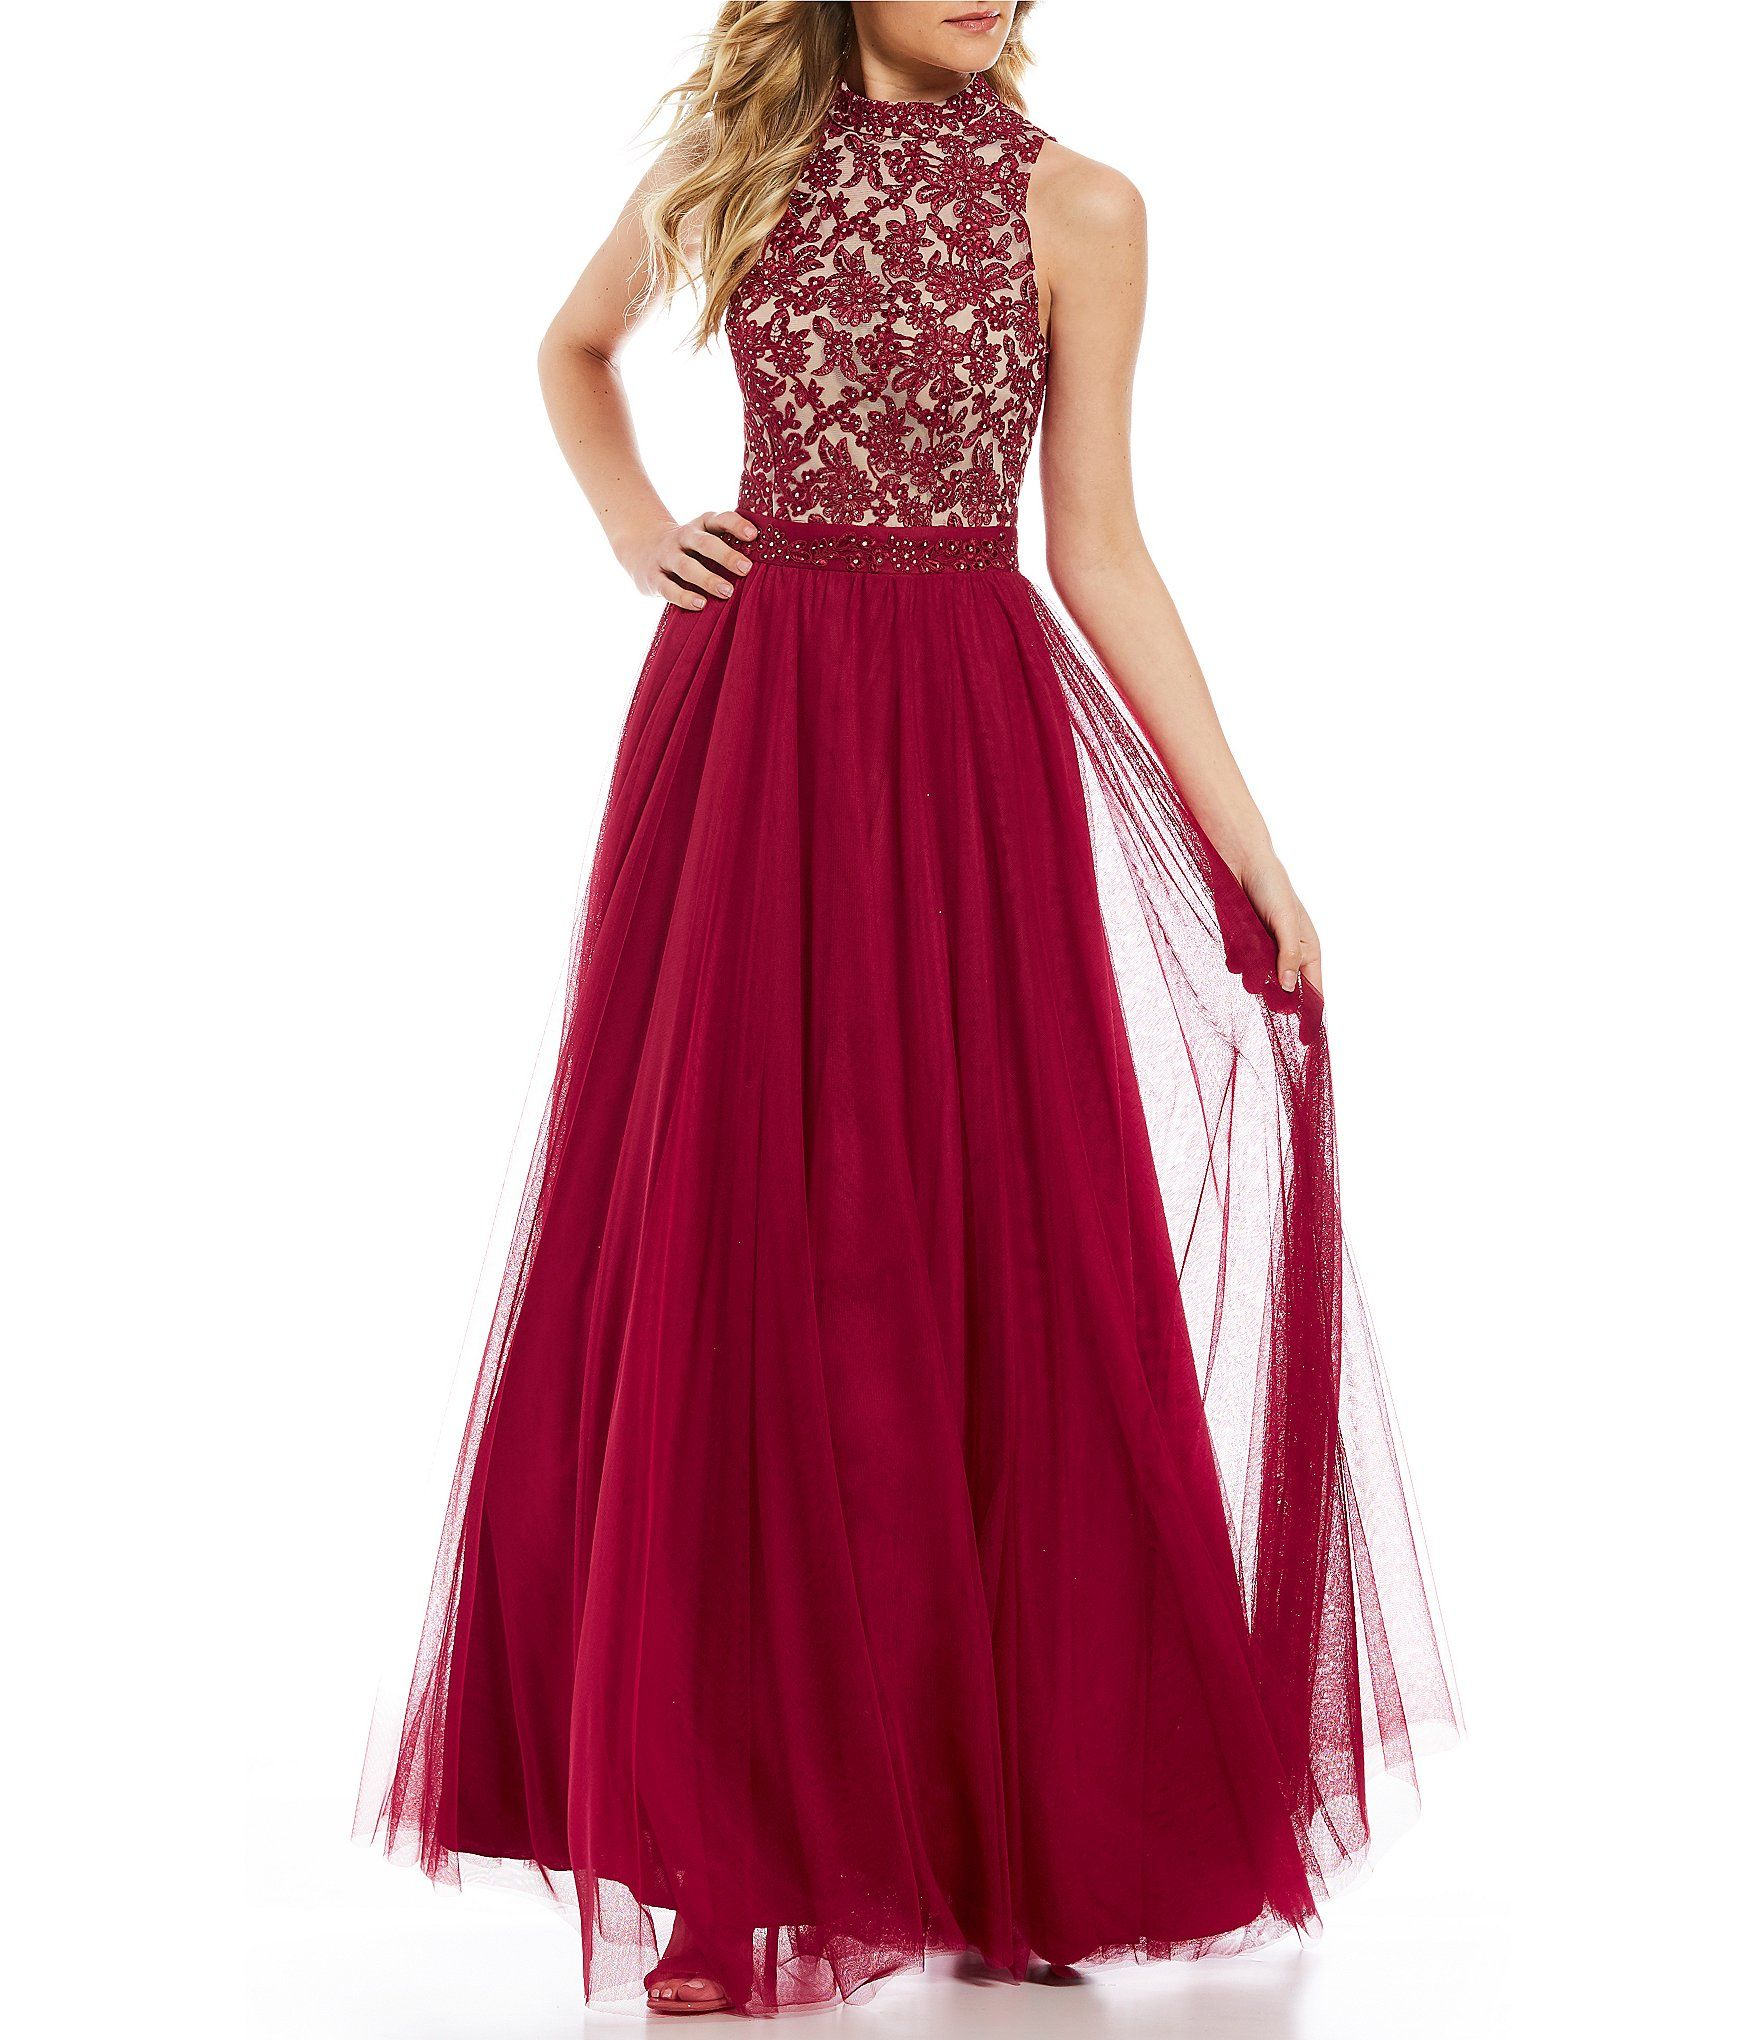 6710fa83f2 Red Prom Dresses 2018 Dillards - Gomes Weine AG